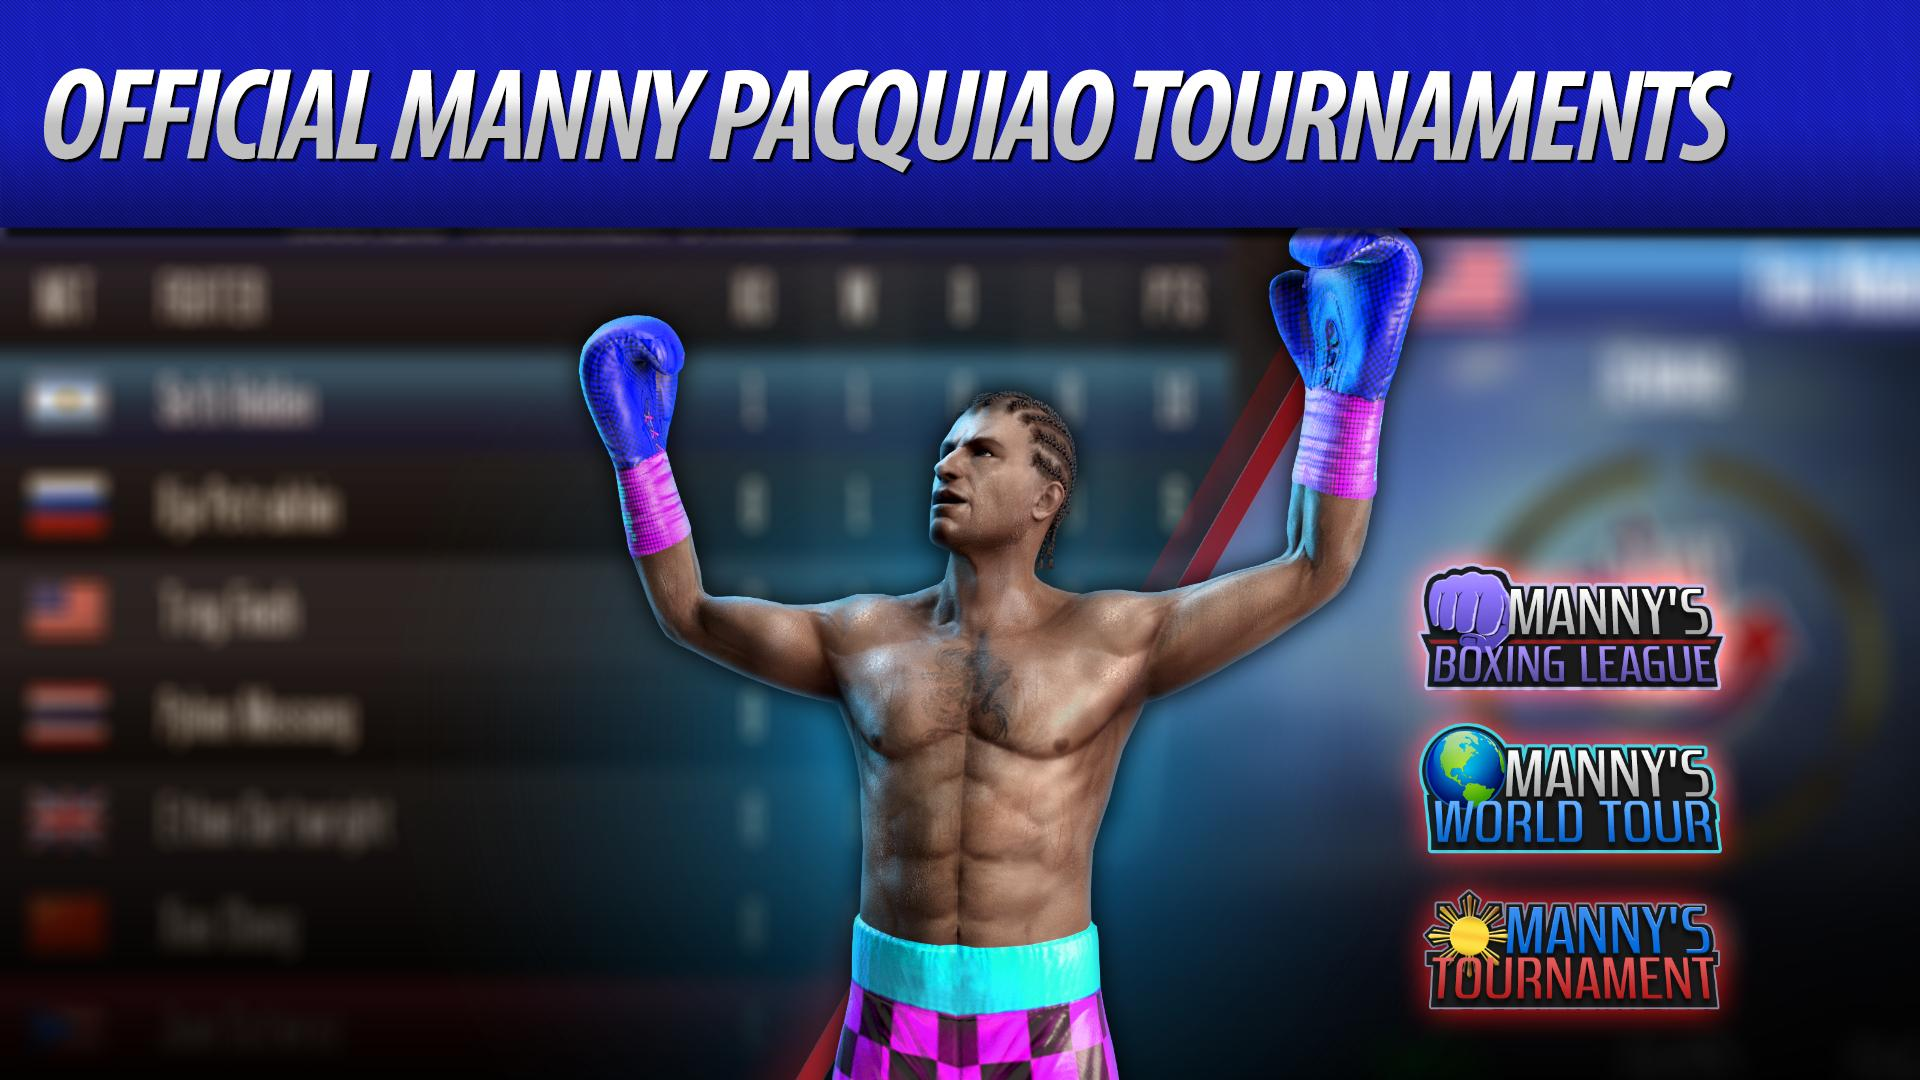 Real Boxing Manny Pacquiao 1.1.1 Screenshot 4